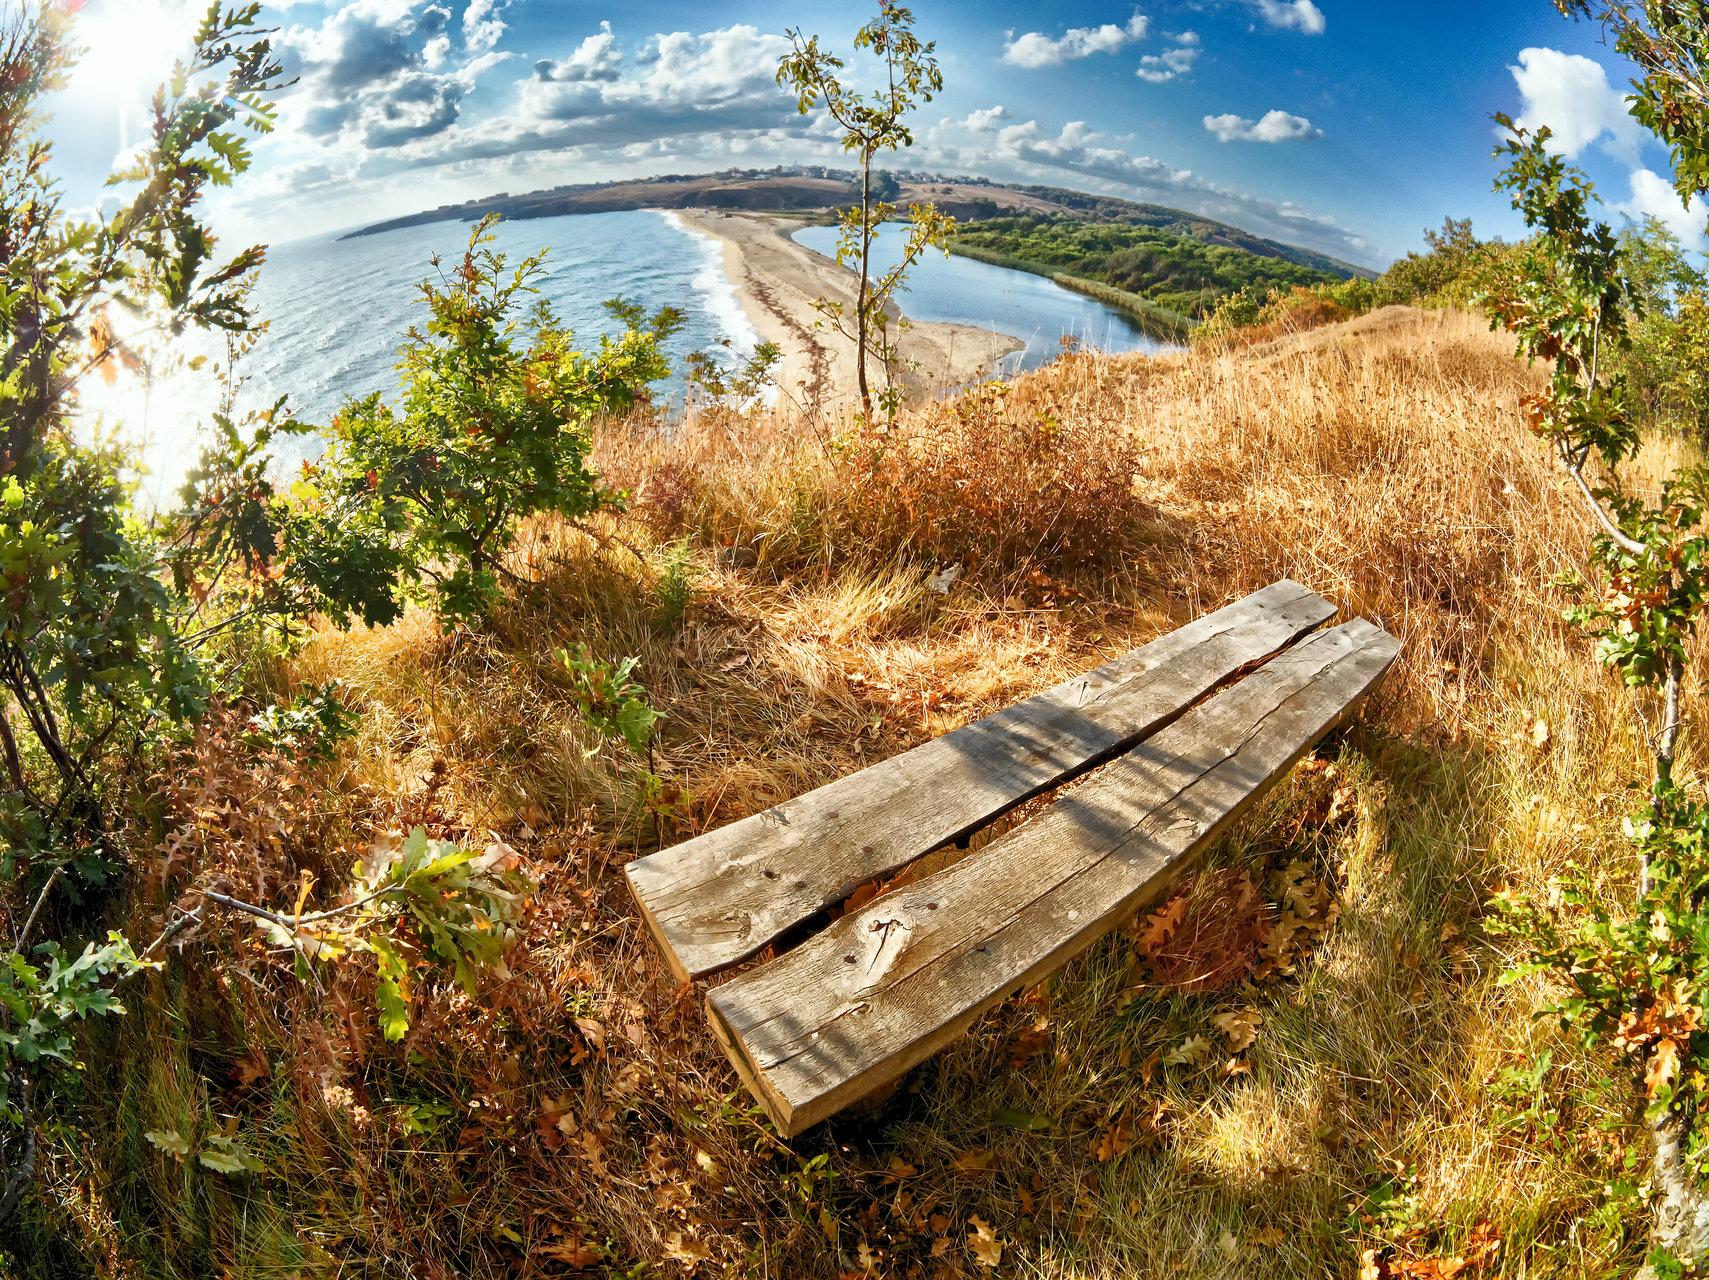 Photo in Landscape | Author sfhjrtykikyhuj  - wddrtgtfvv | PHOTO FORUM